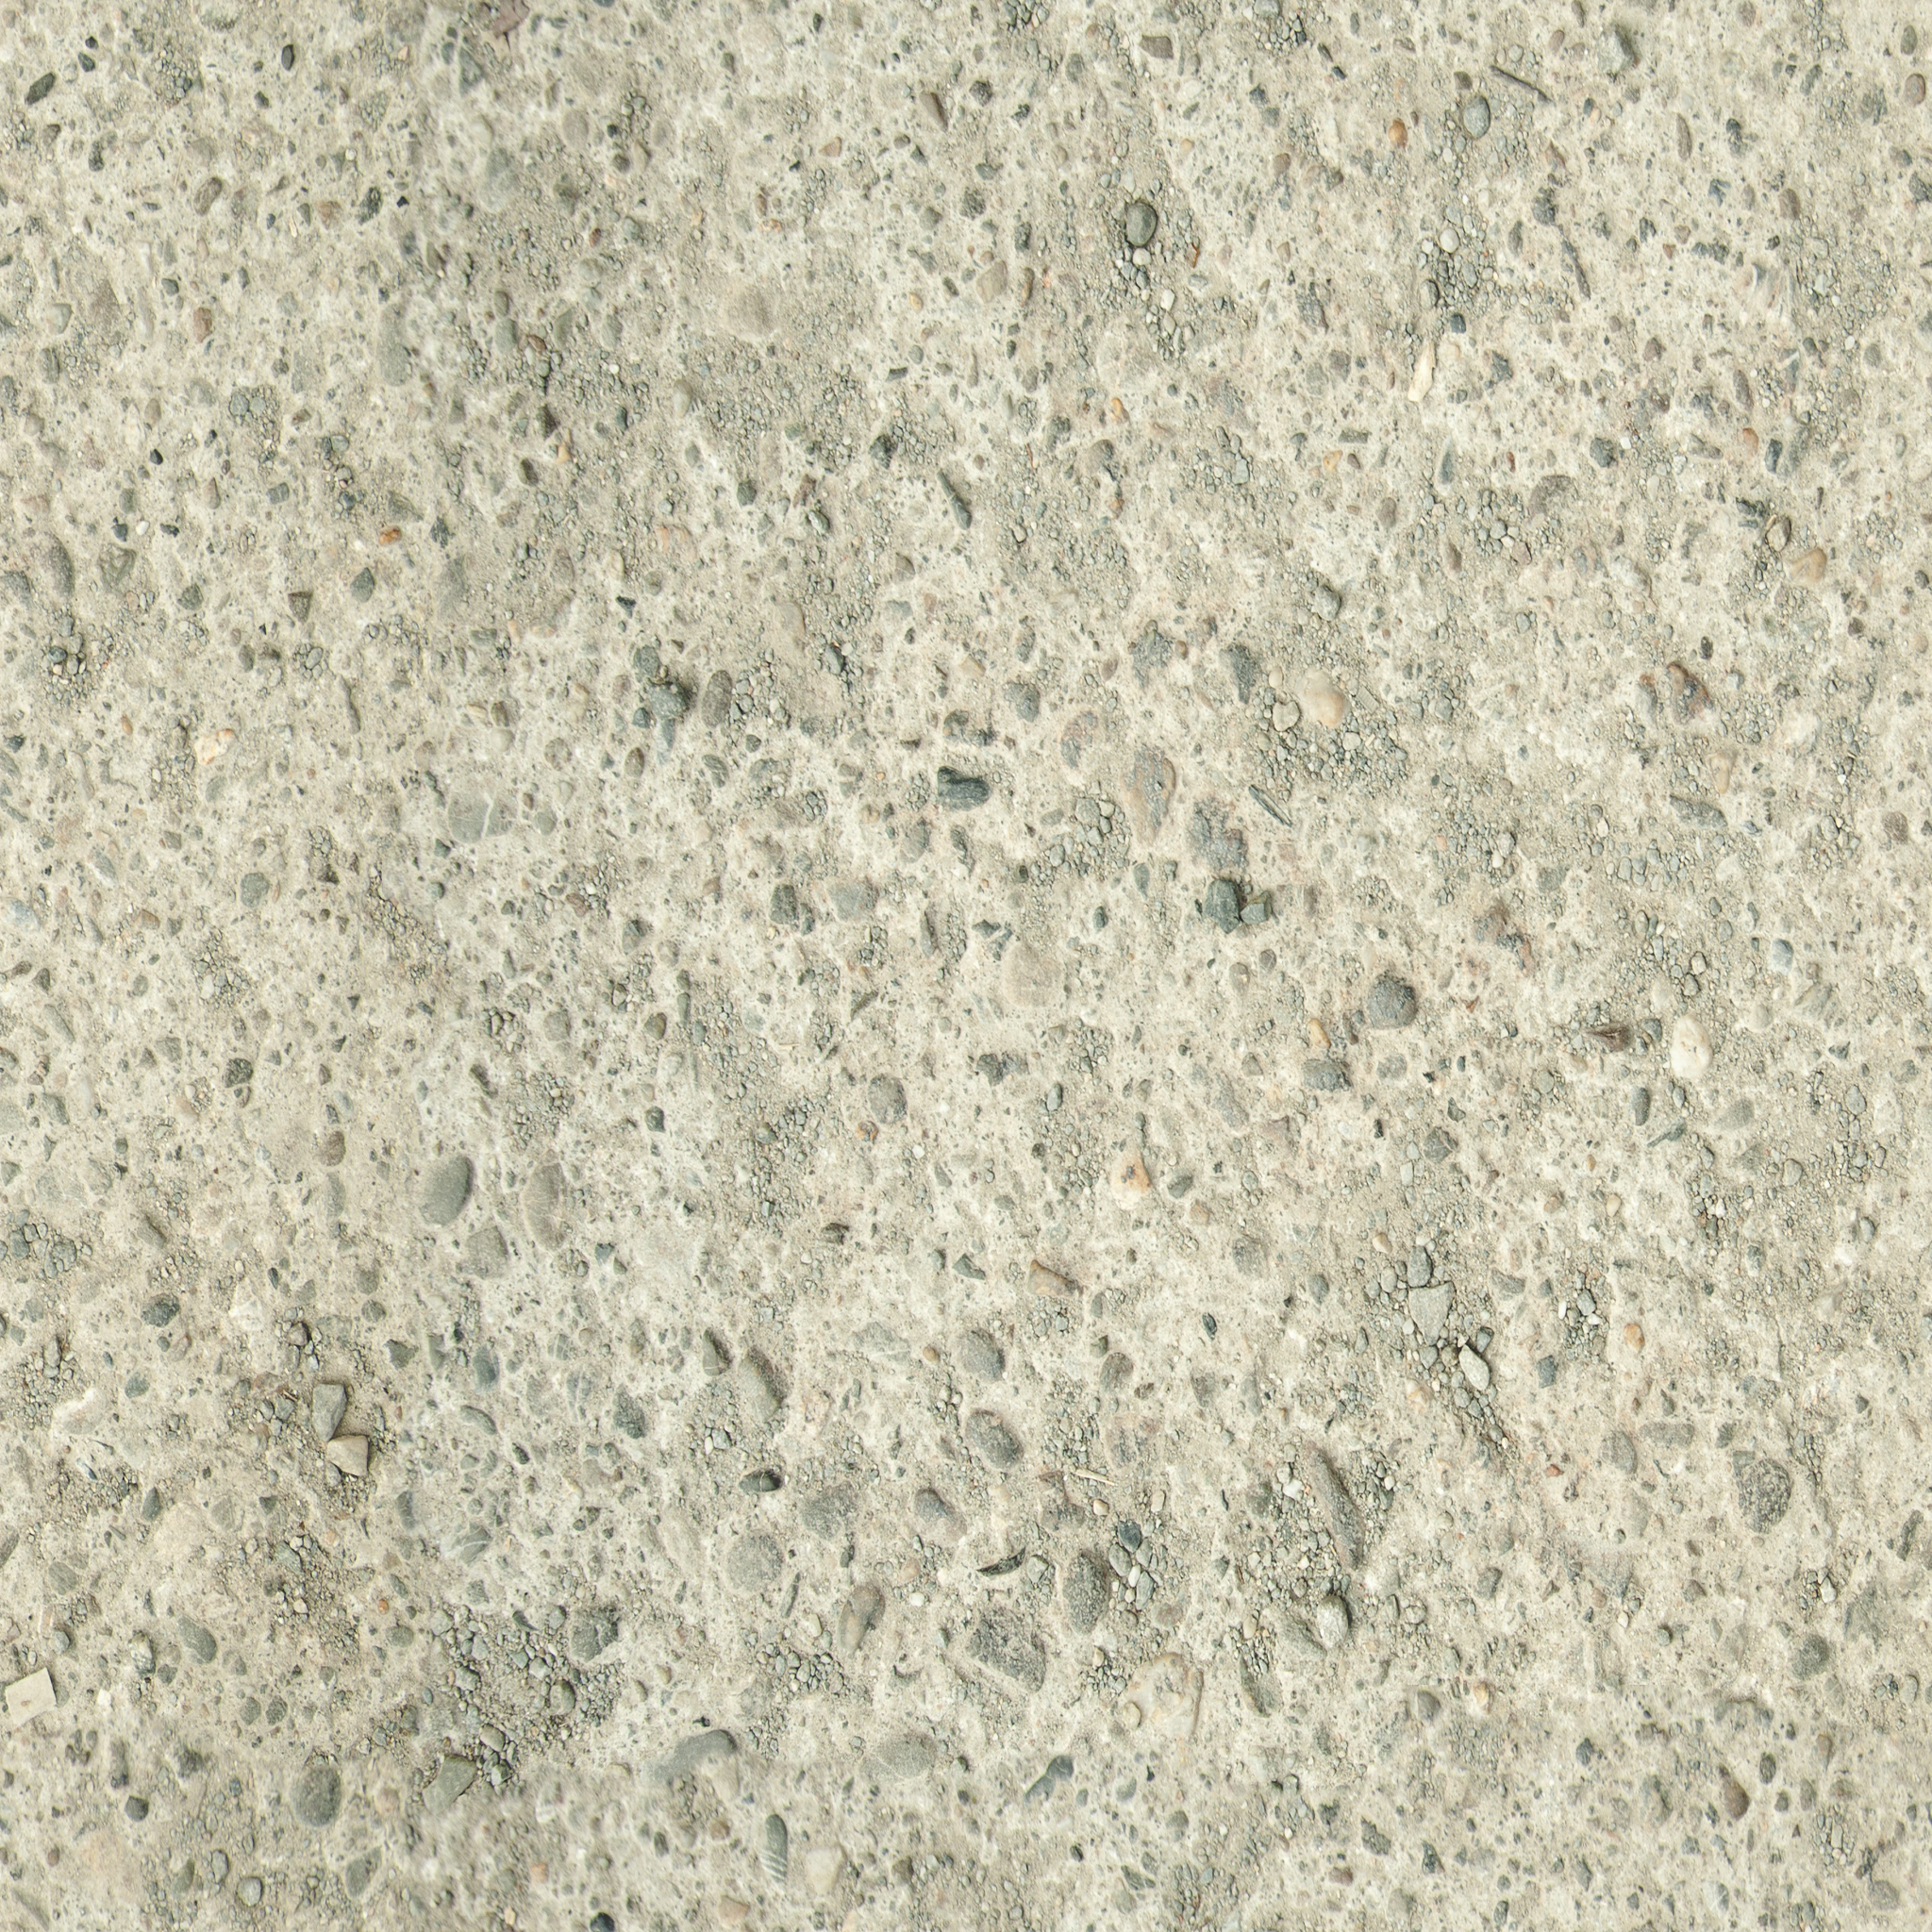 Gray and Cream Concrete.jpg